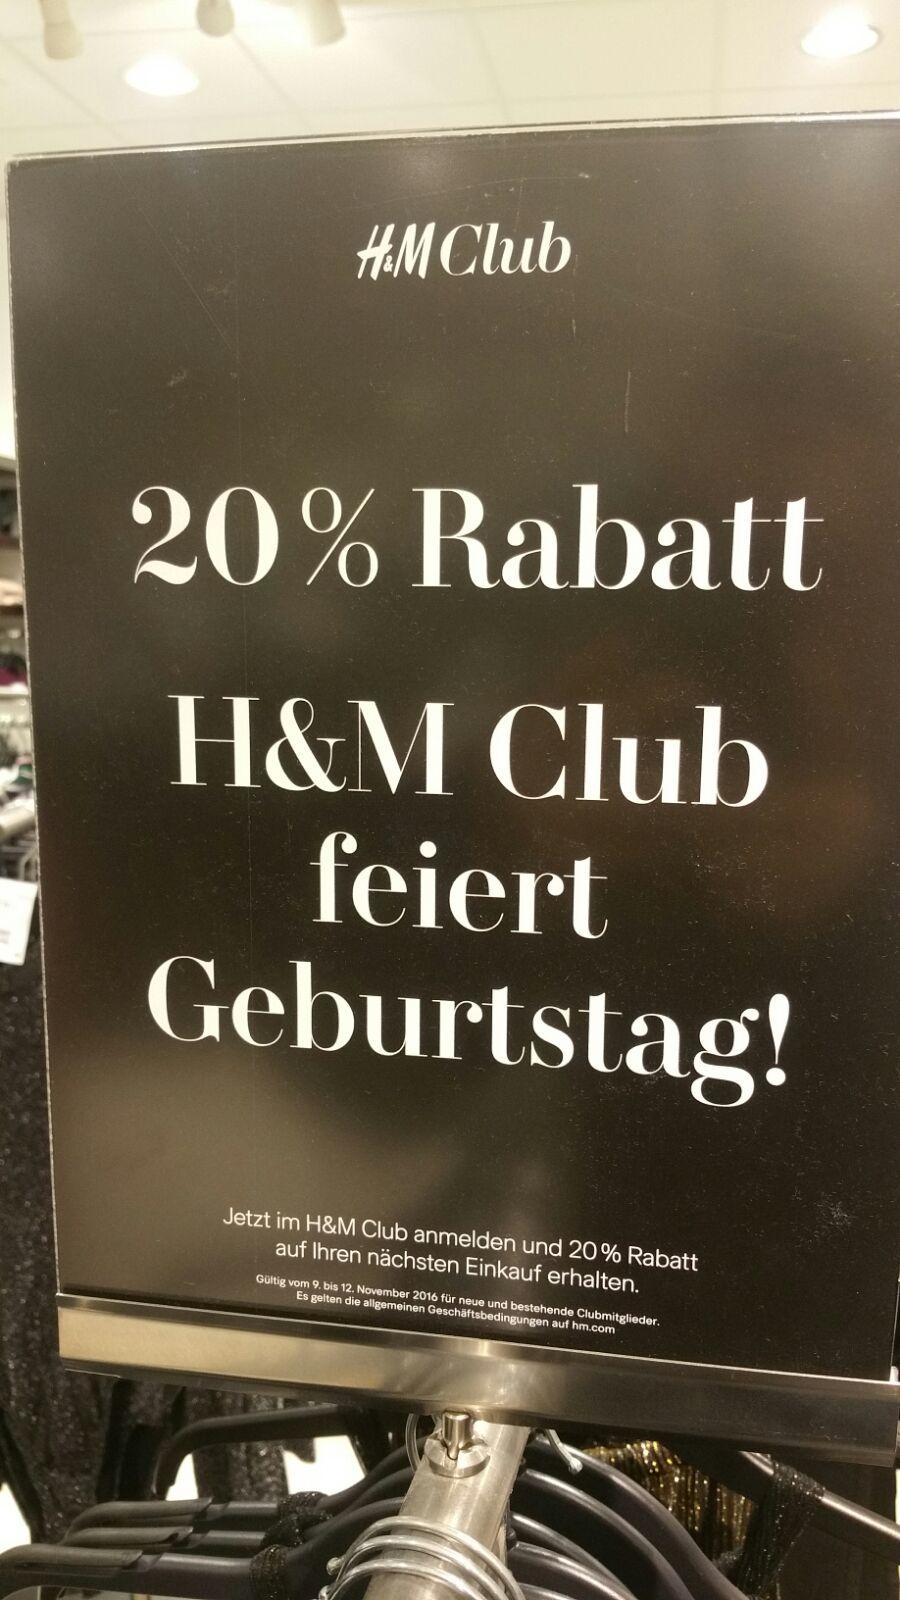 H&M - 20% Rabatt (H&M Club feiert Geburtstag)